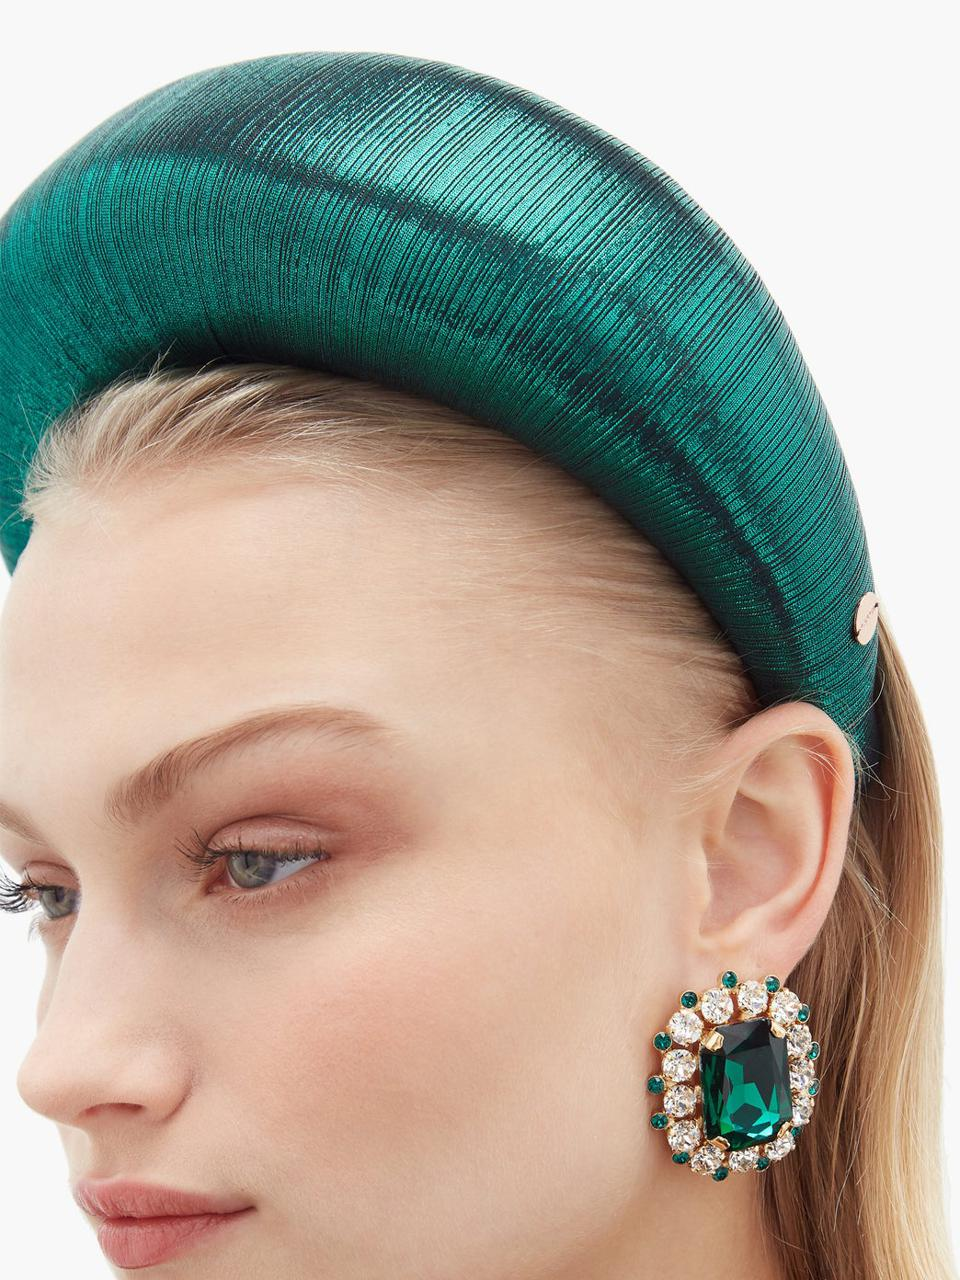 Edvige lamé headband by FLAPPER: